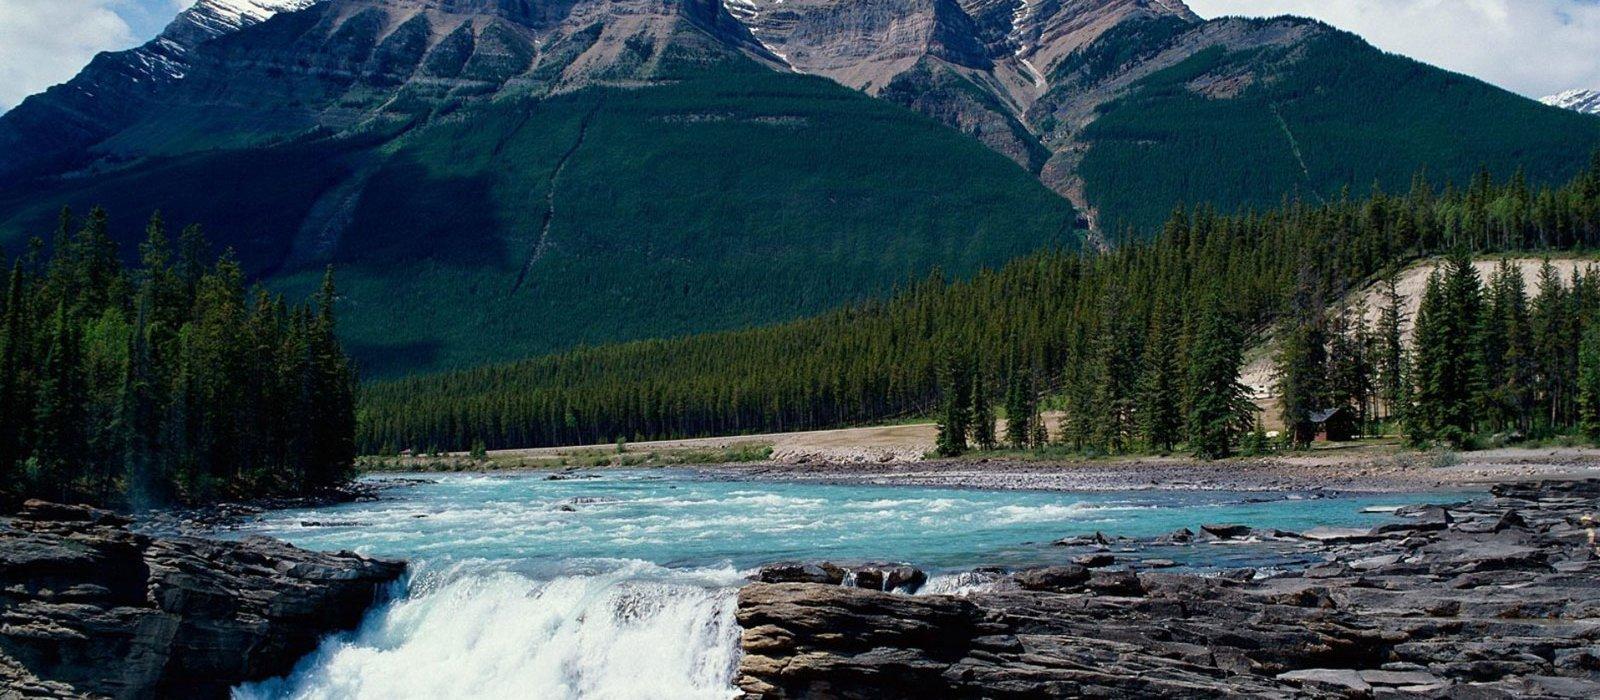 HALLMARK CANADIAN ROCKIES